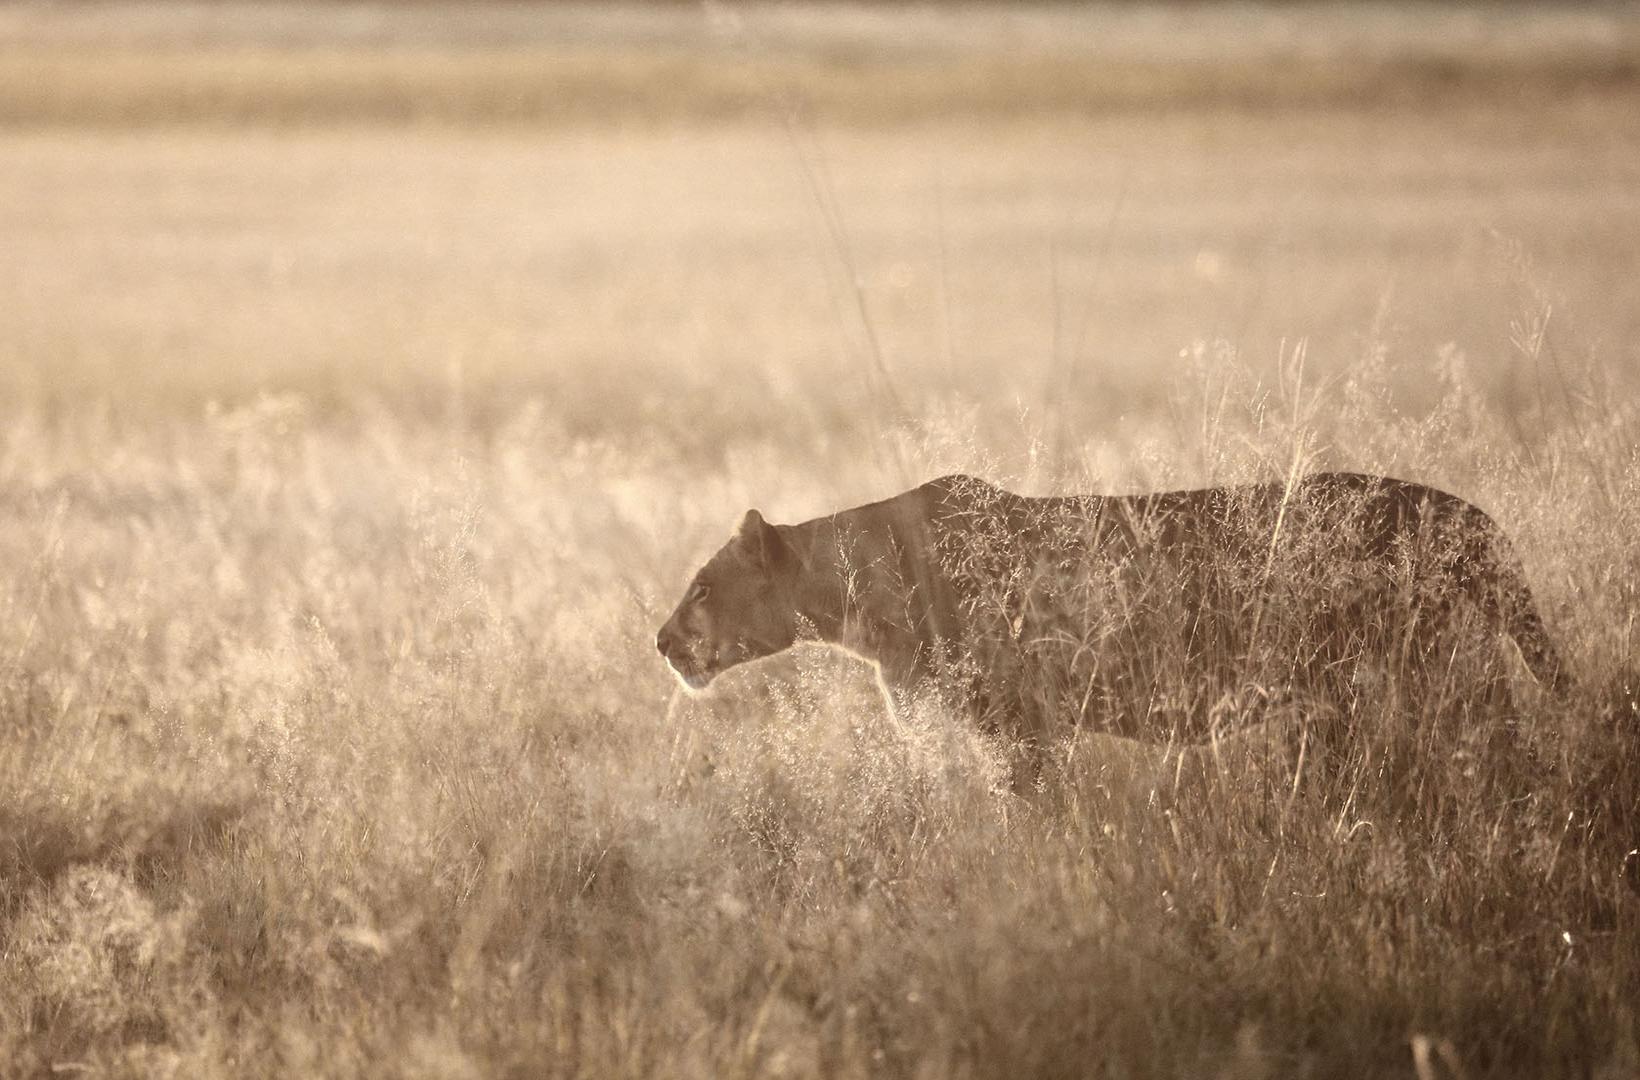 African lioness stalks through long grass at dusk at Khwai River Botswana